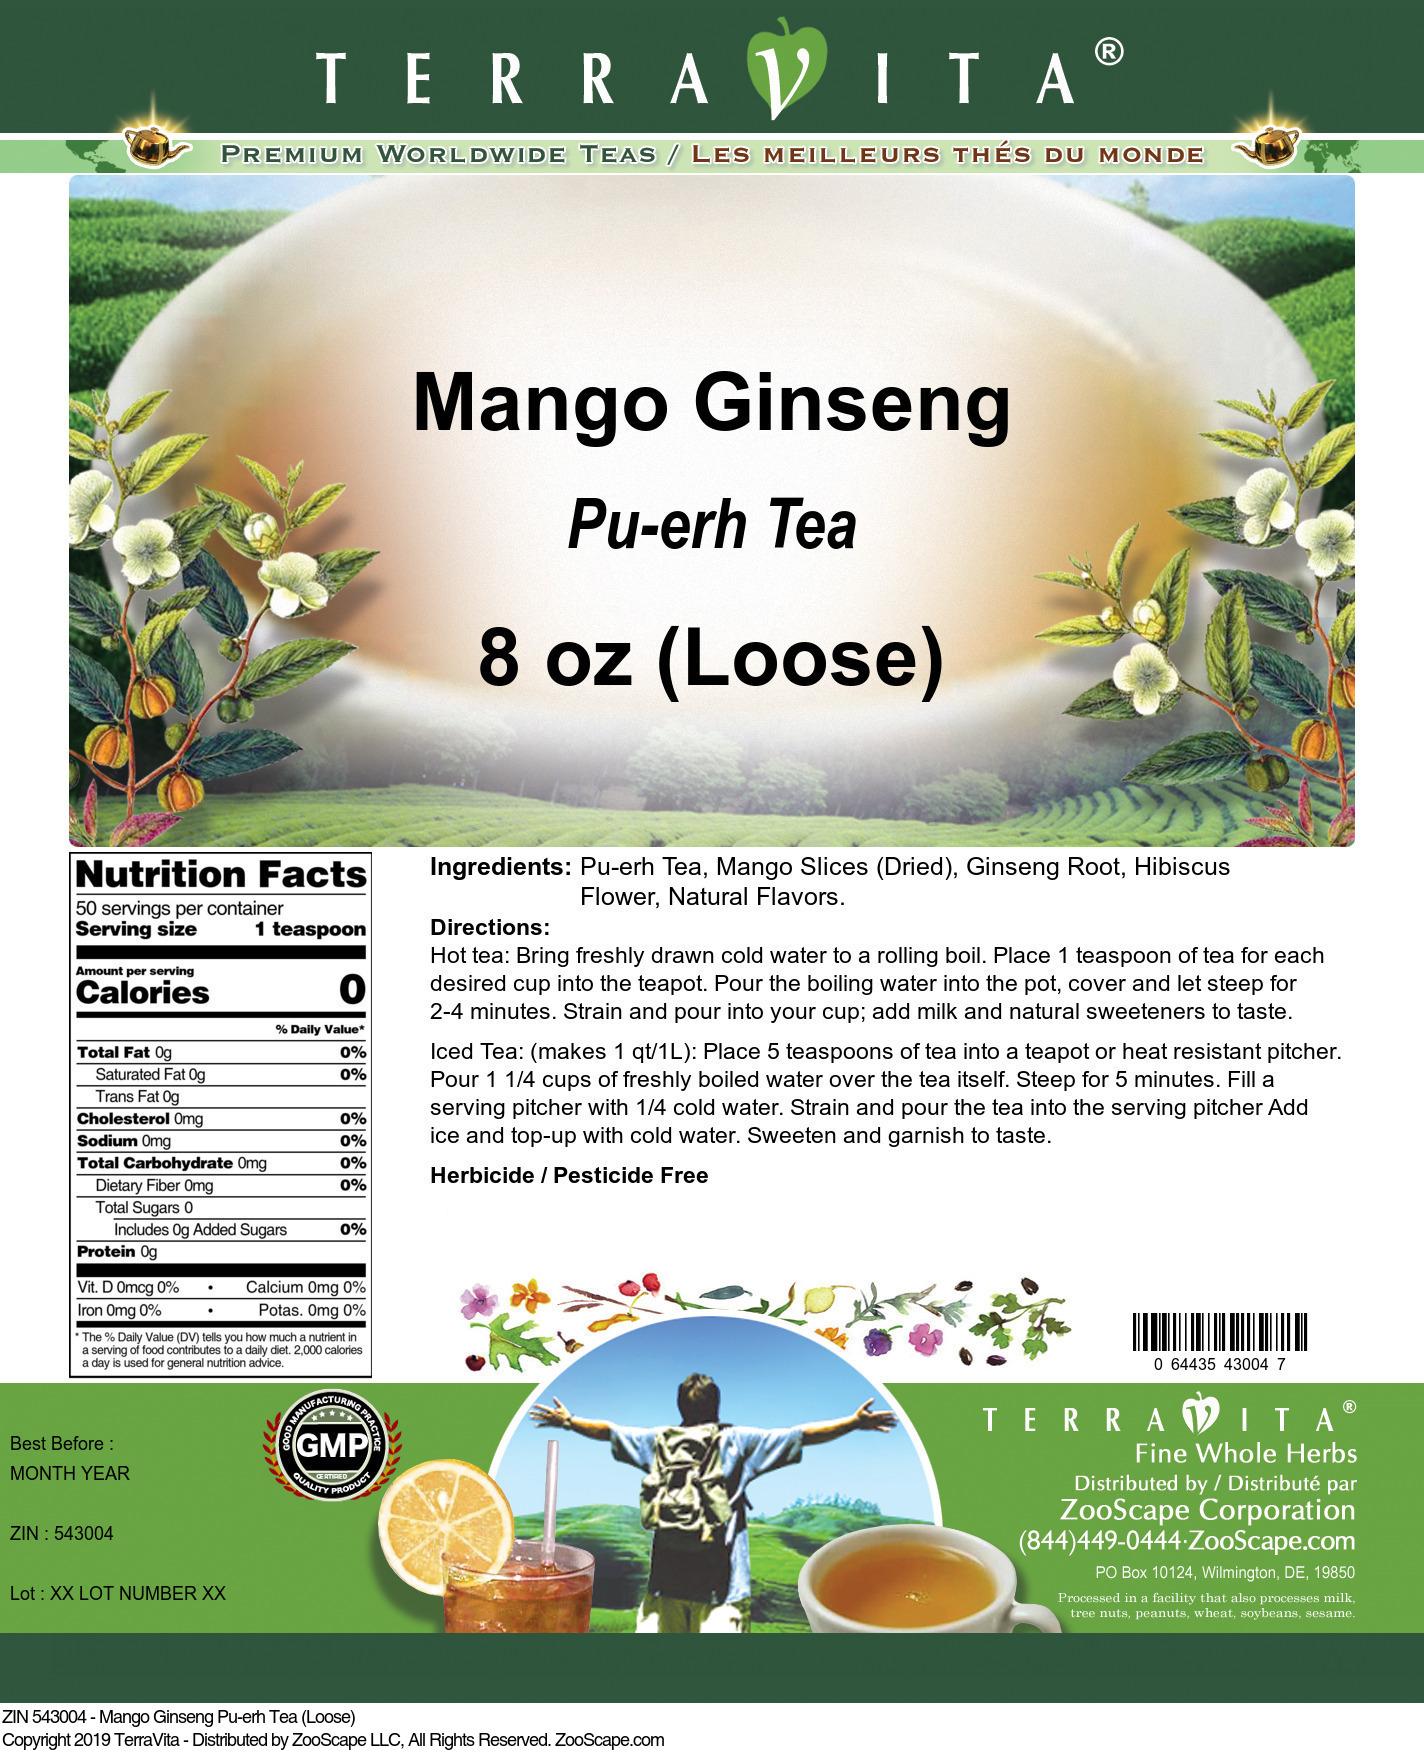 Mango Ginseng Pu-erh Tea (Loose)